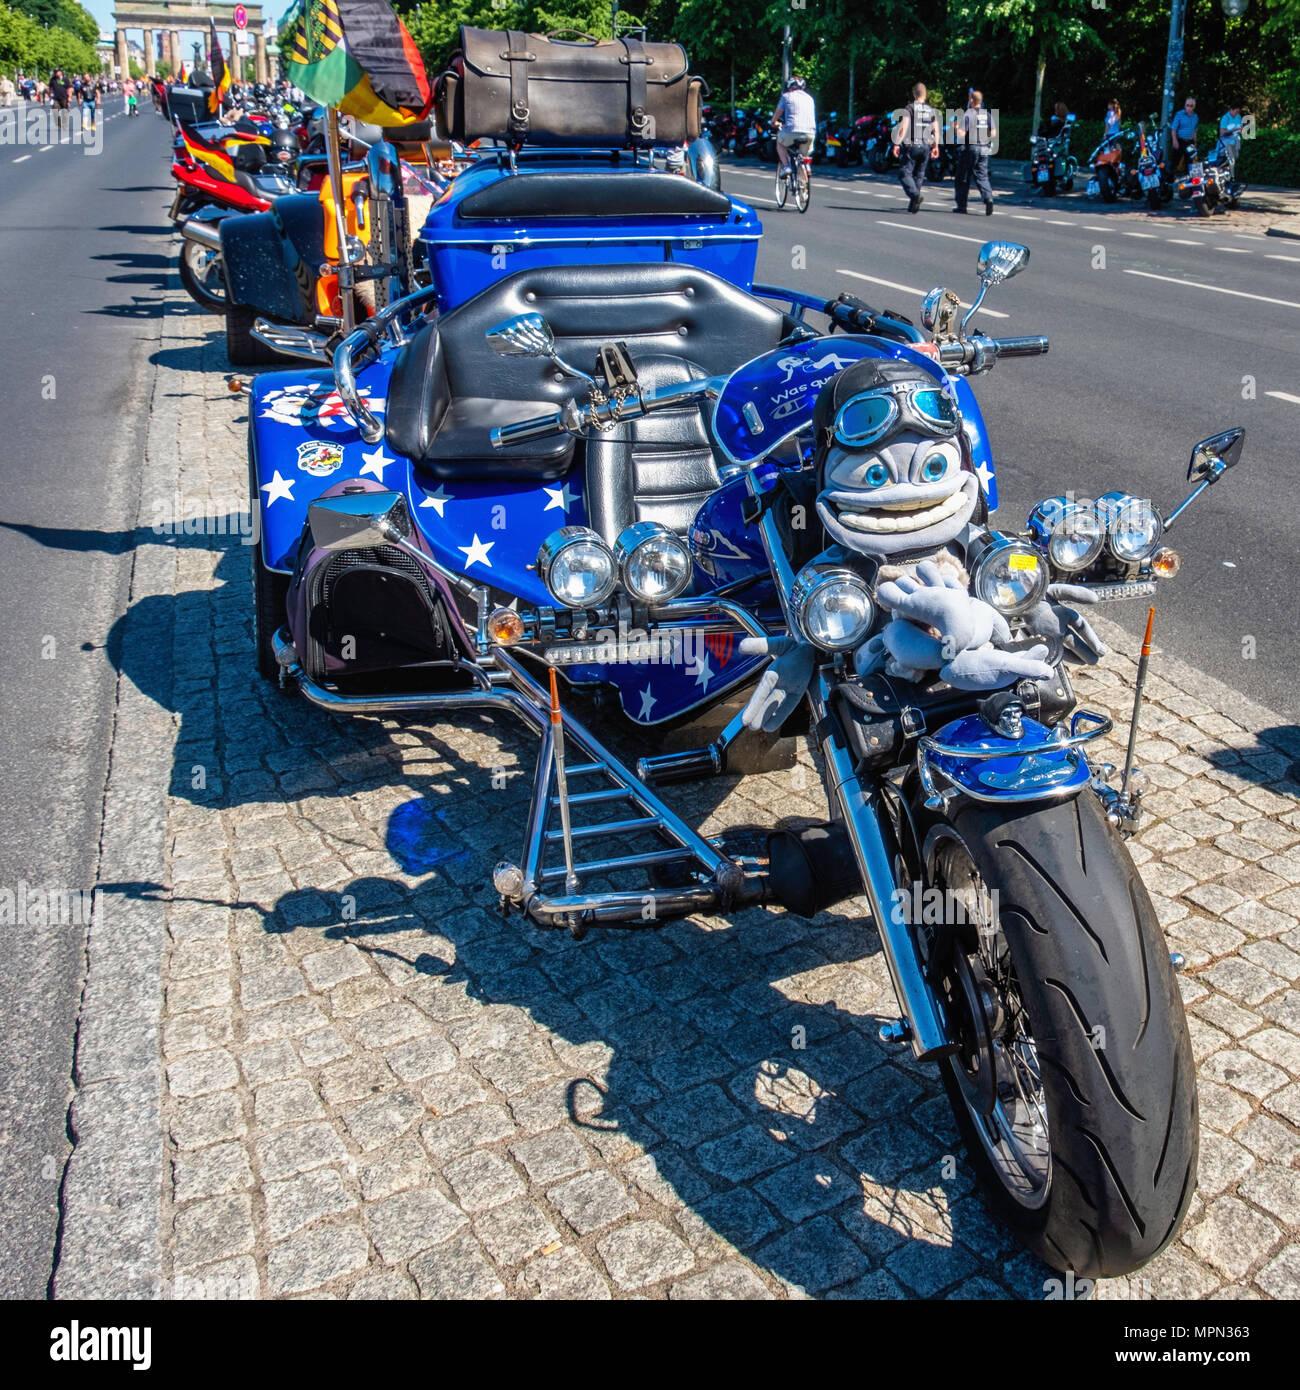 Berlin Mitte, Motor bike detail. Blue Parked bike mascot and  in aviators helmetl at Bikers Demo. - Stock Image